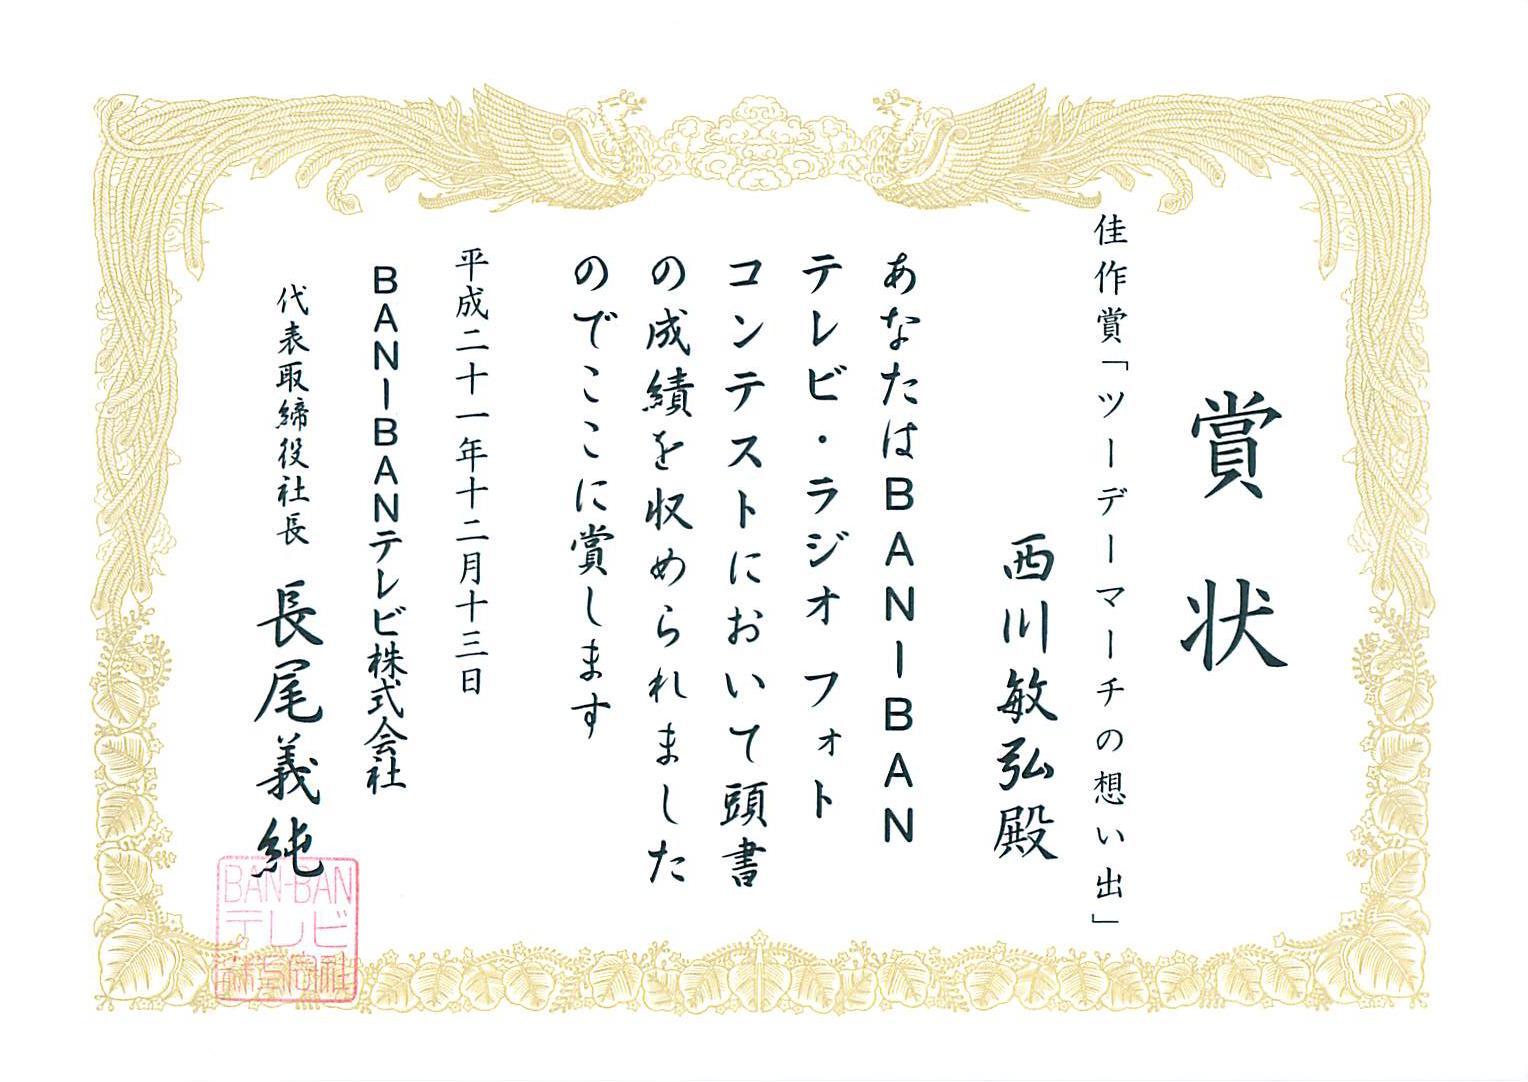 BAN-BANテレビ・ラジオ カレンダーフォトコンテスト 佳作_a0288226_152016.jpg